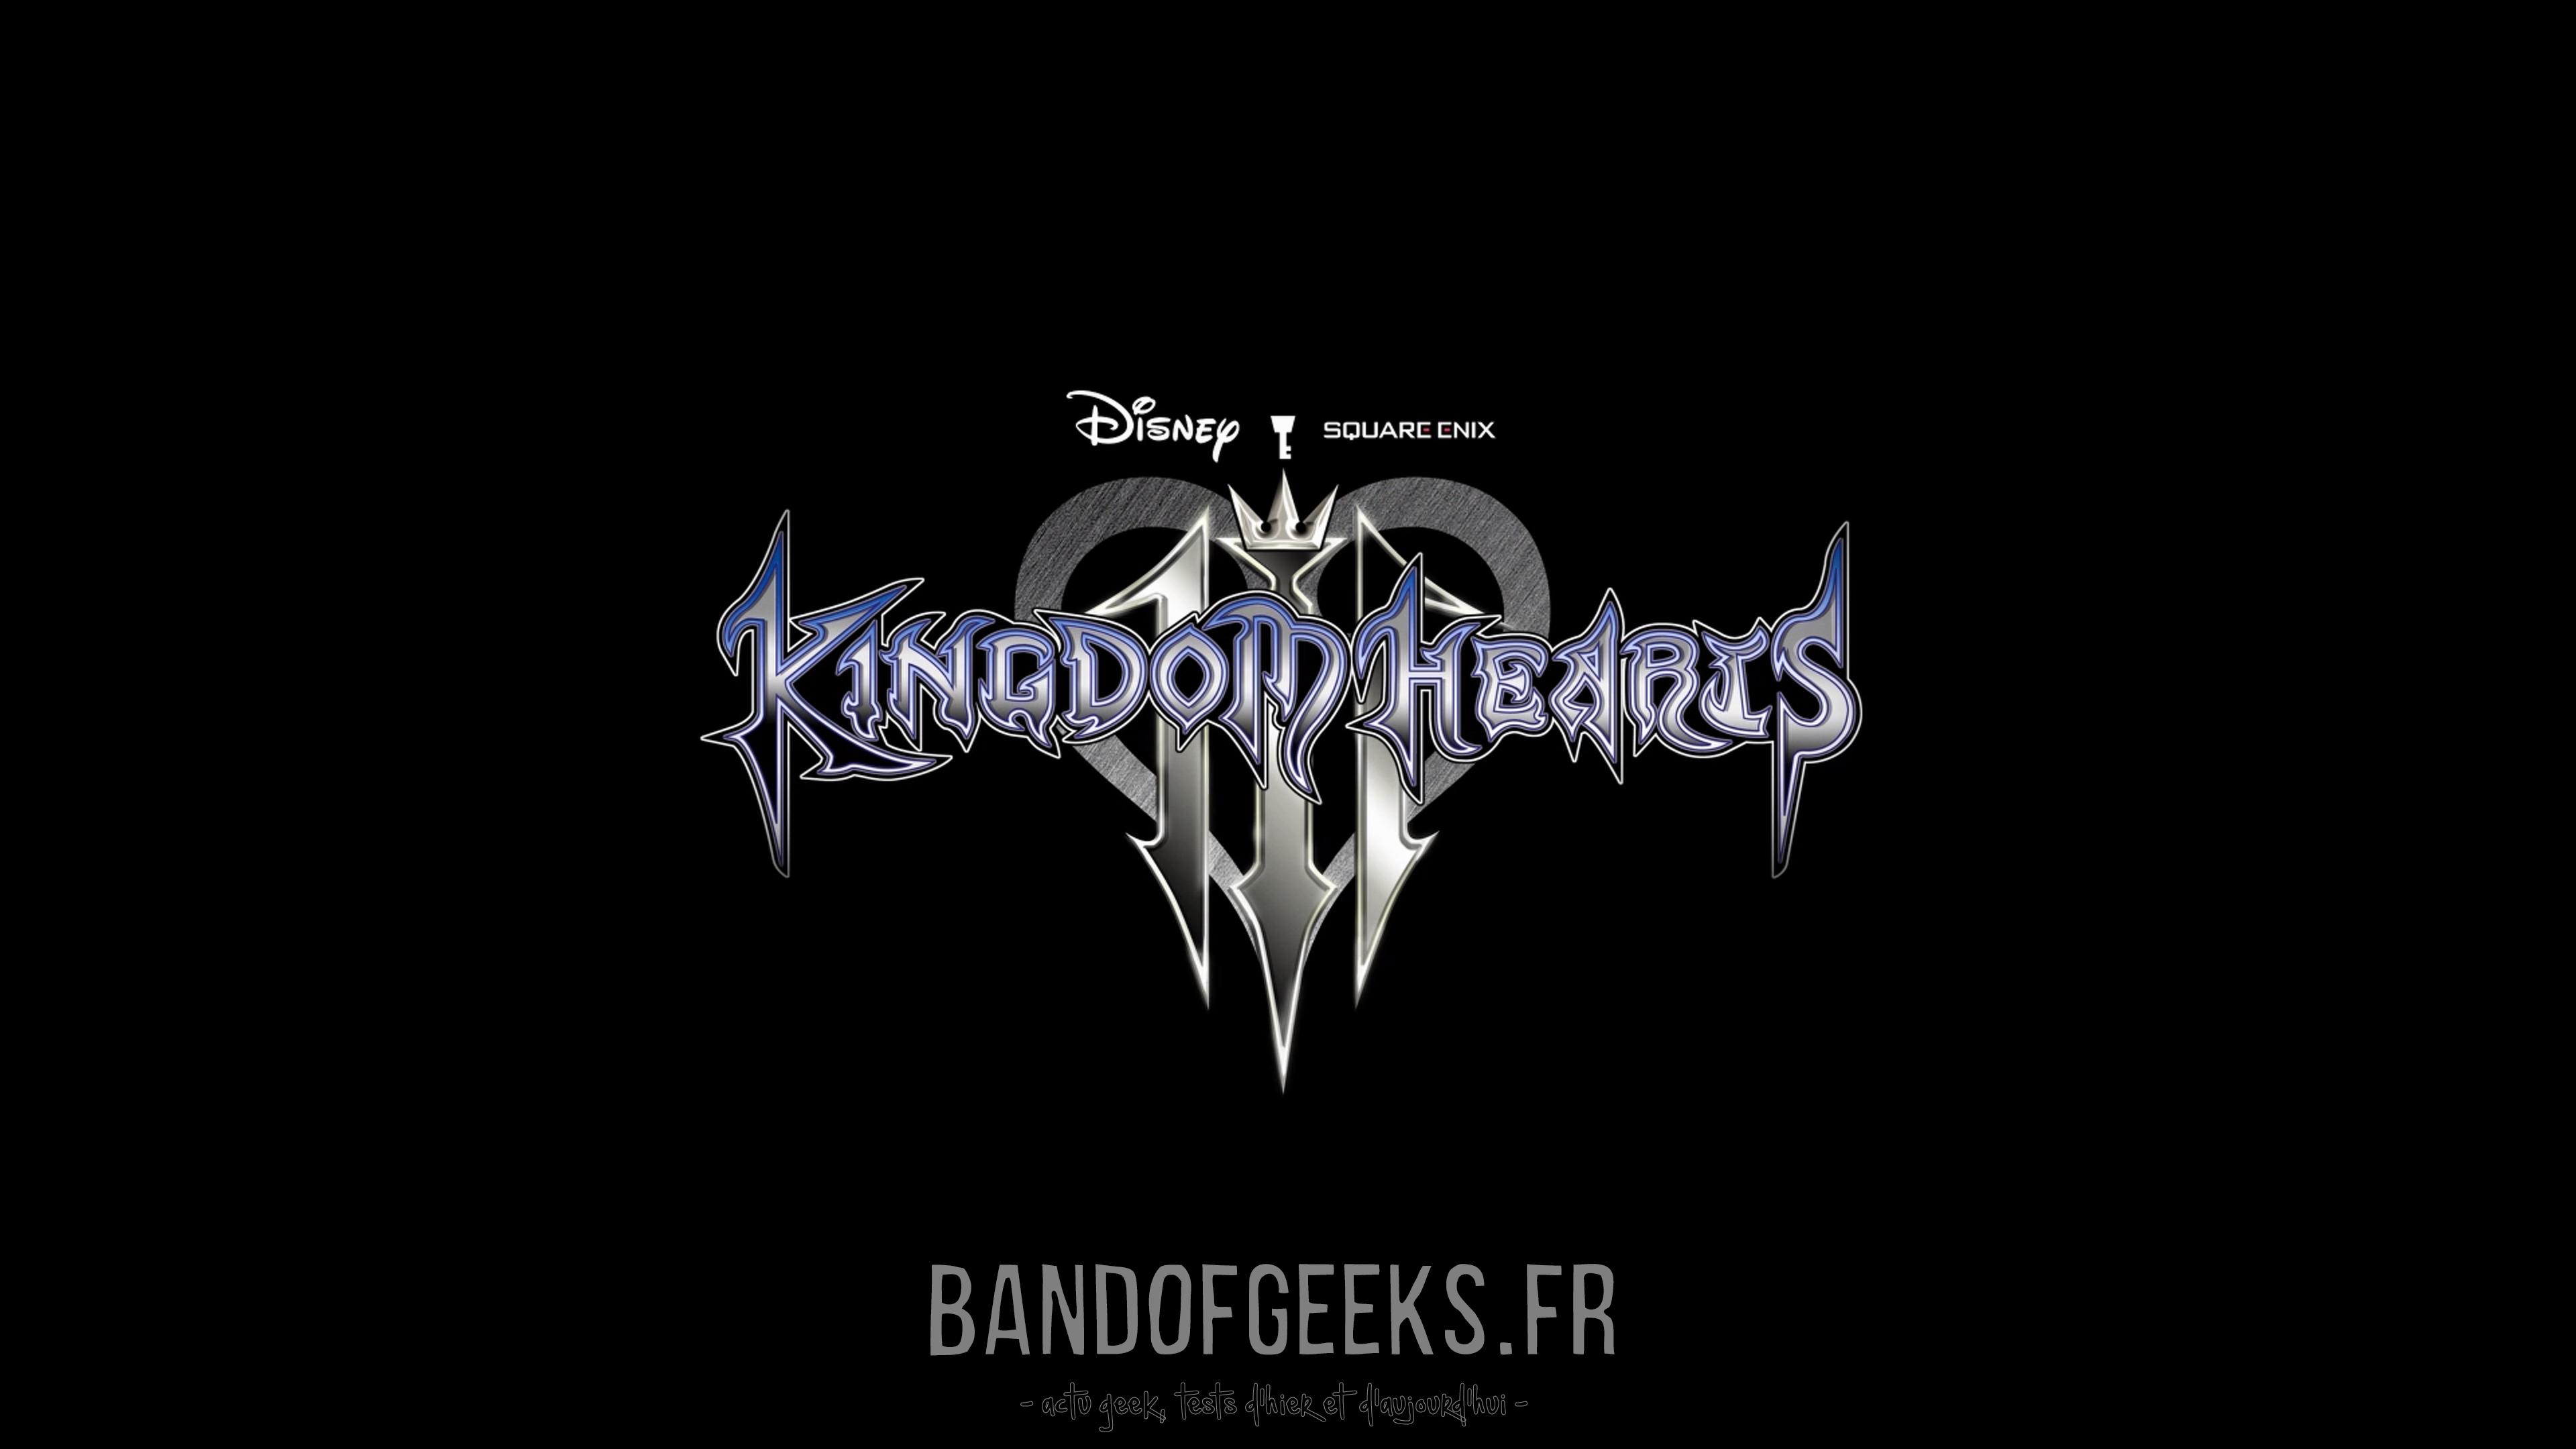 Logo Kingdom Hearts III sur fond noir